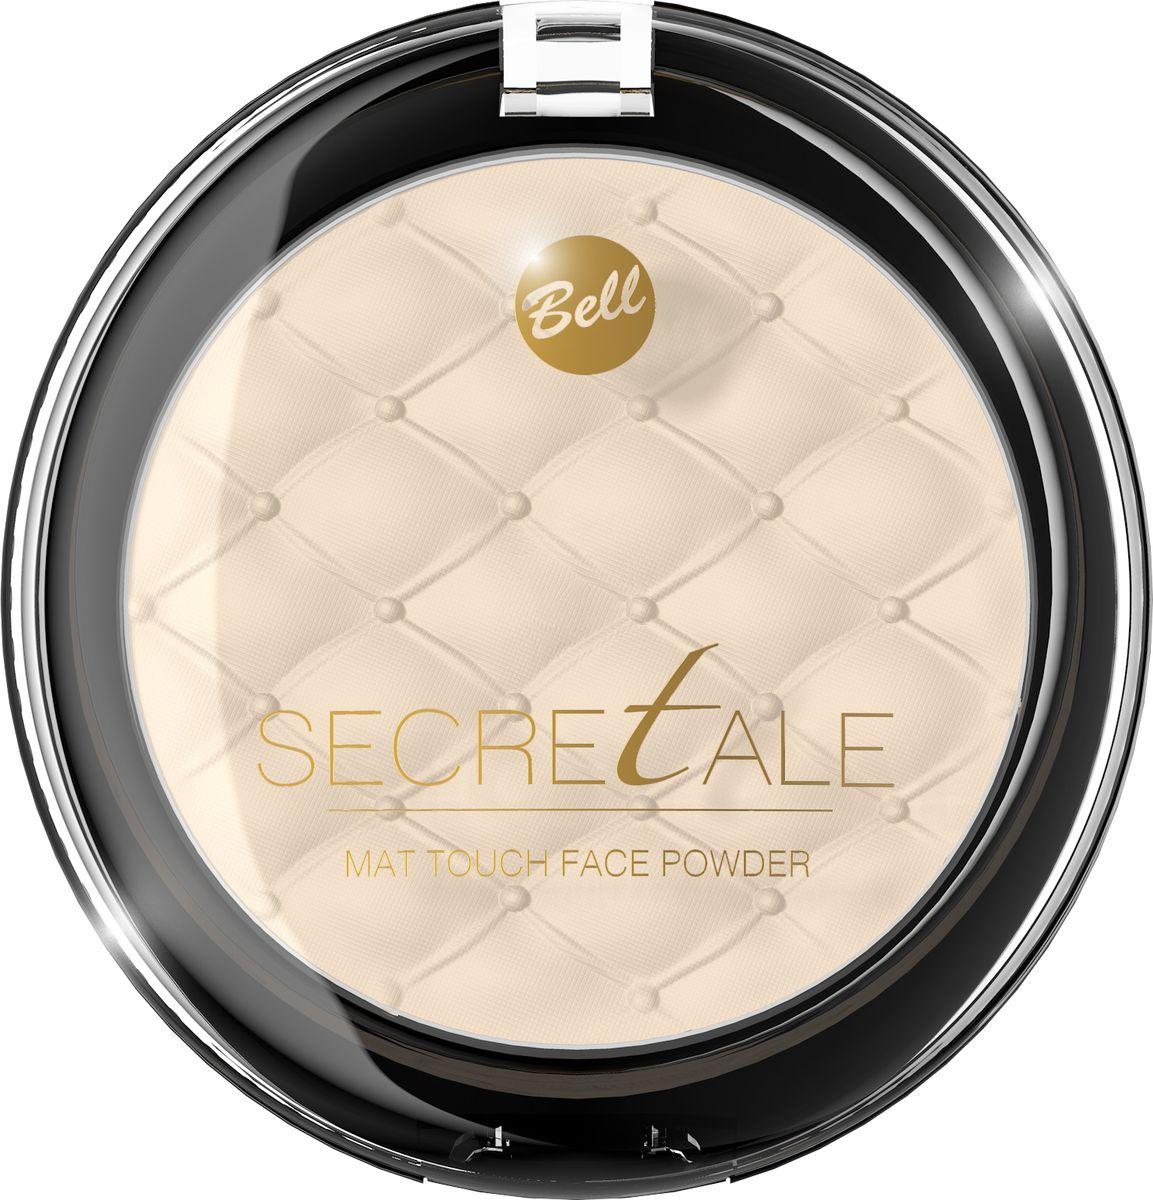 Bell Пудра Матирующая Фиксирующая Макияж Secretale Mat Touch Face Powder Тон 01